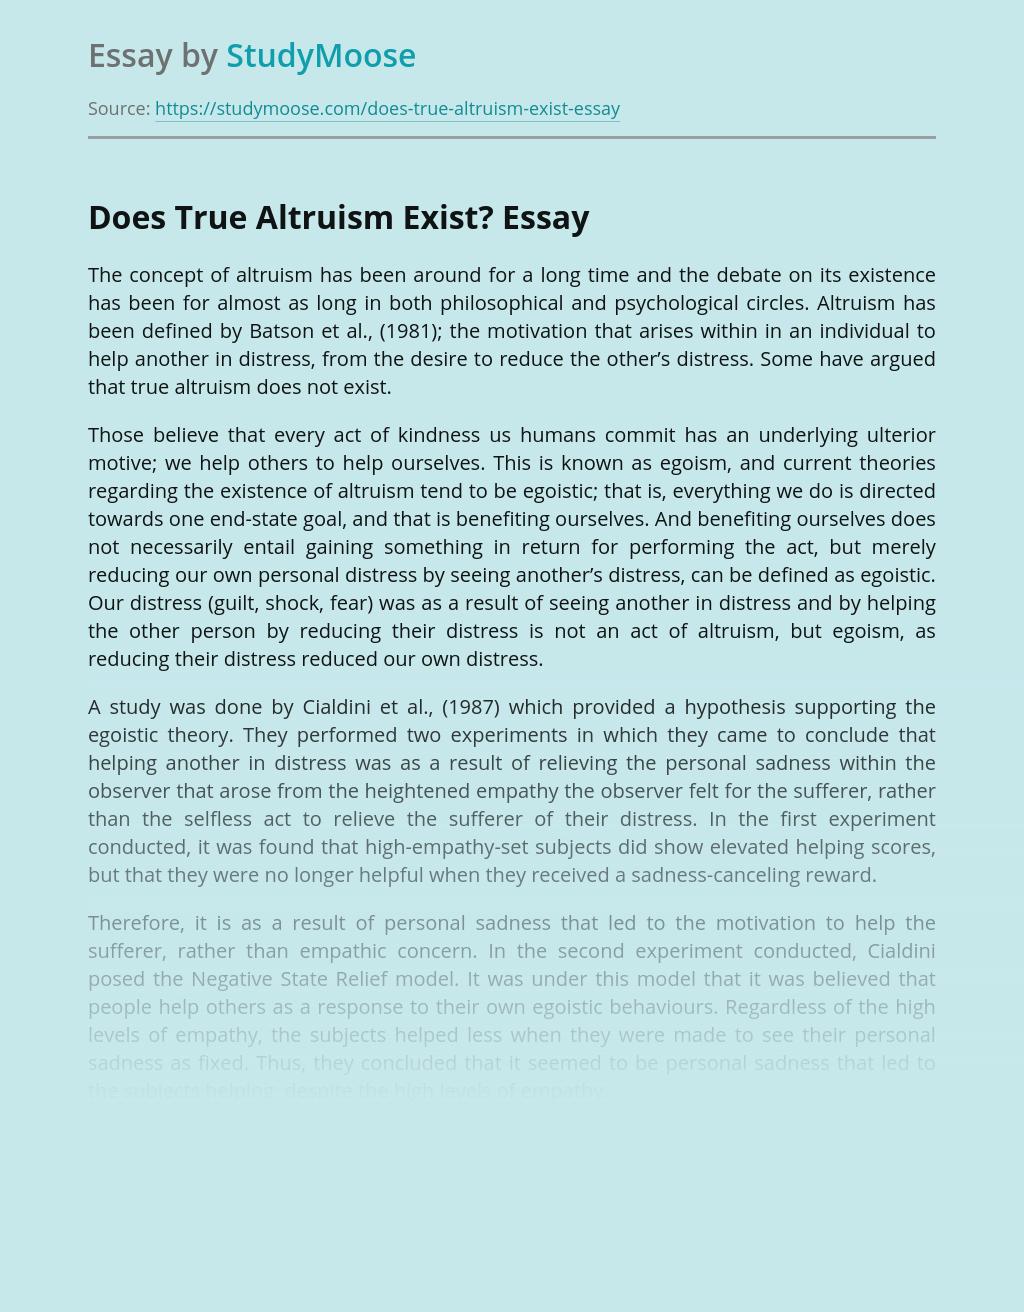 Does True Altruism Exist?